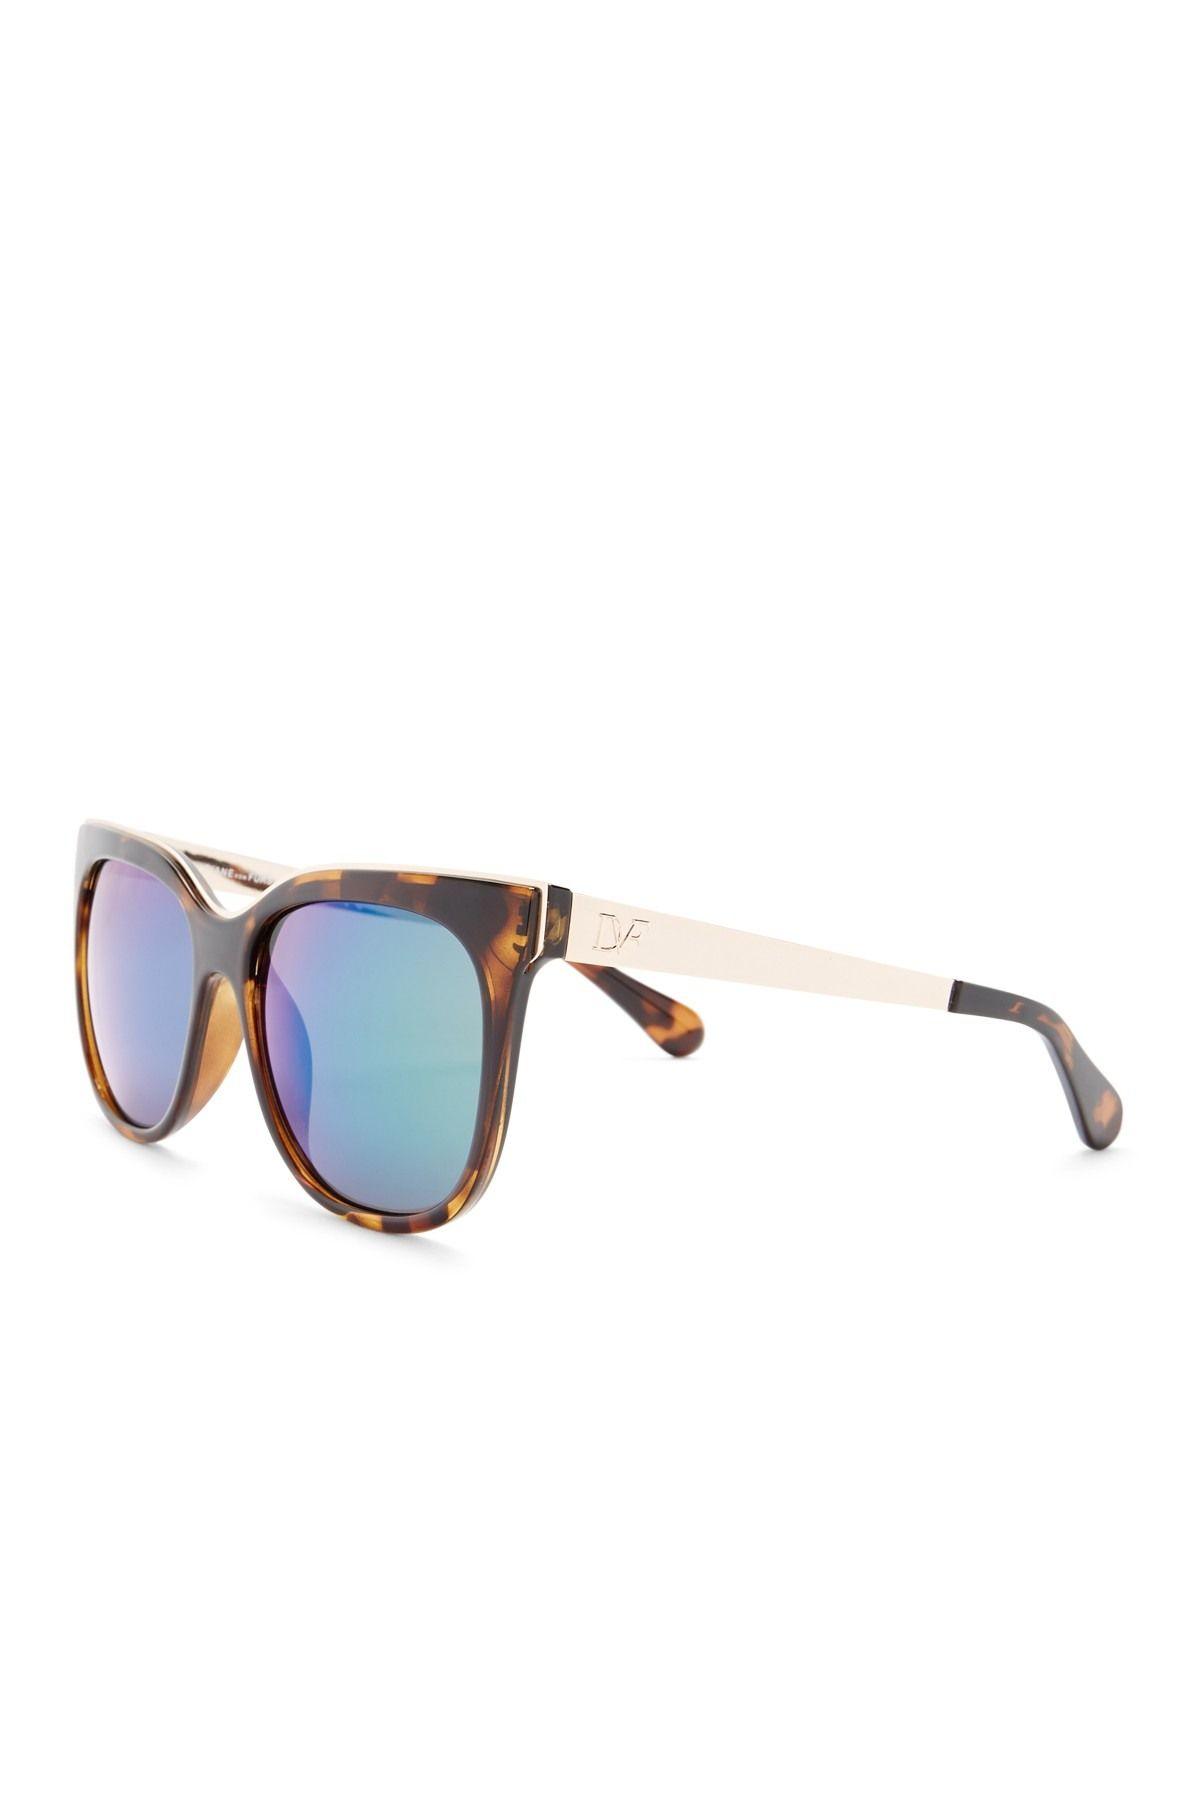 893f322e8d0a Diane von Furstenberg   Women's Metal Brow Cat Eye Sunglasses   Nordstrom  Rack